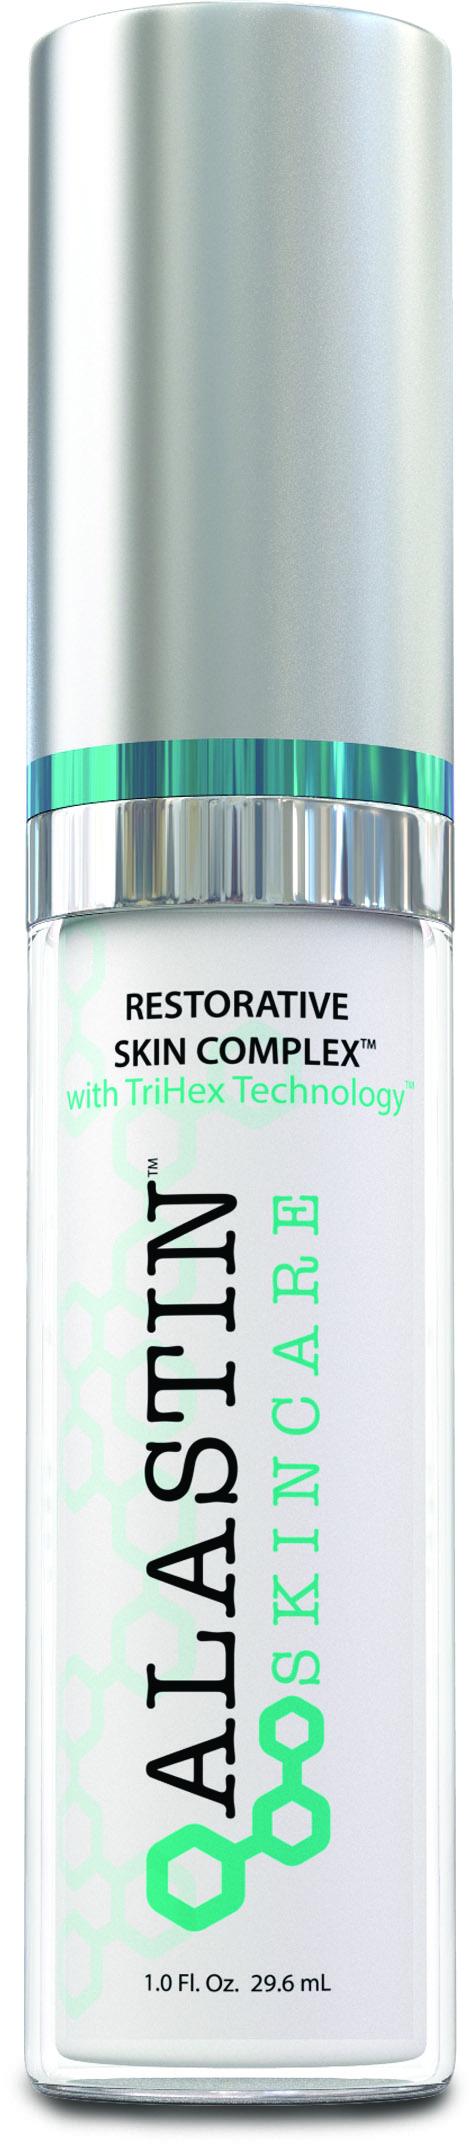 restorative skin complex™